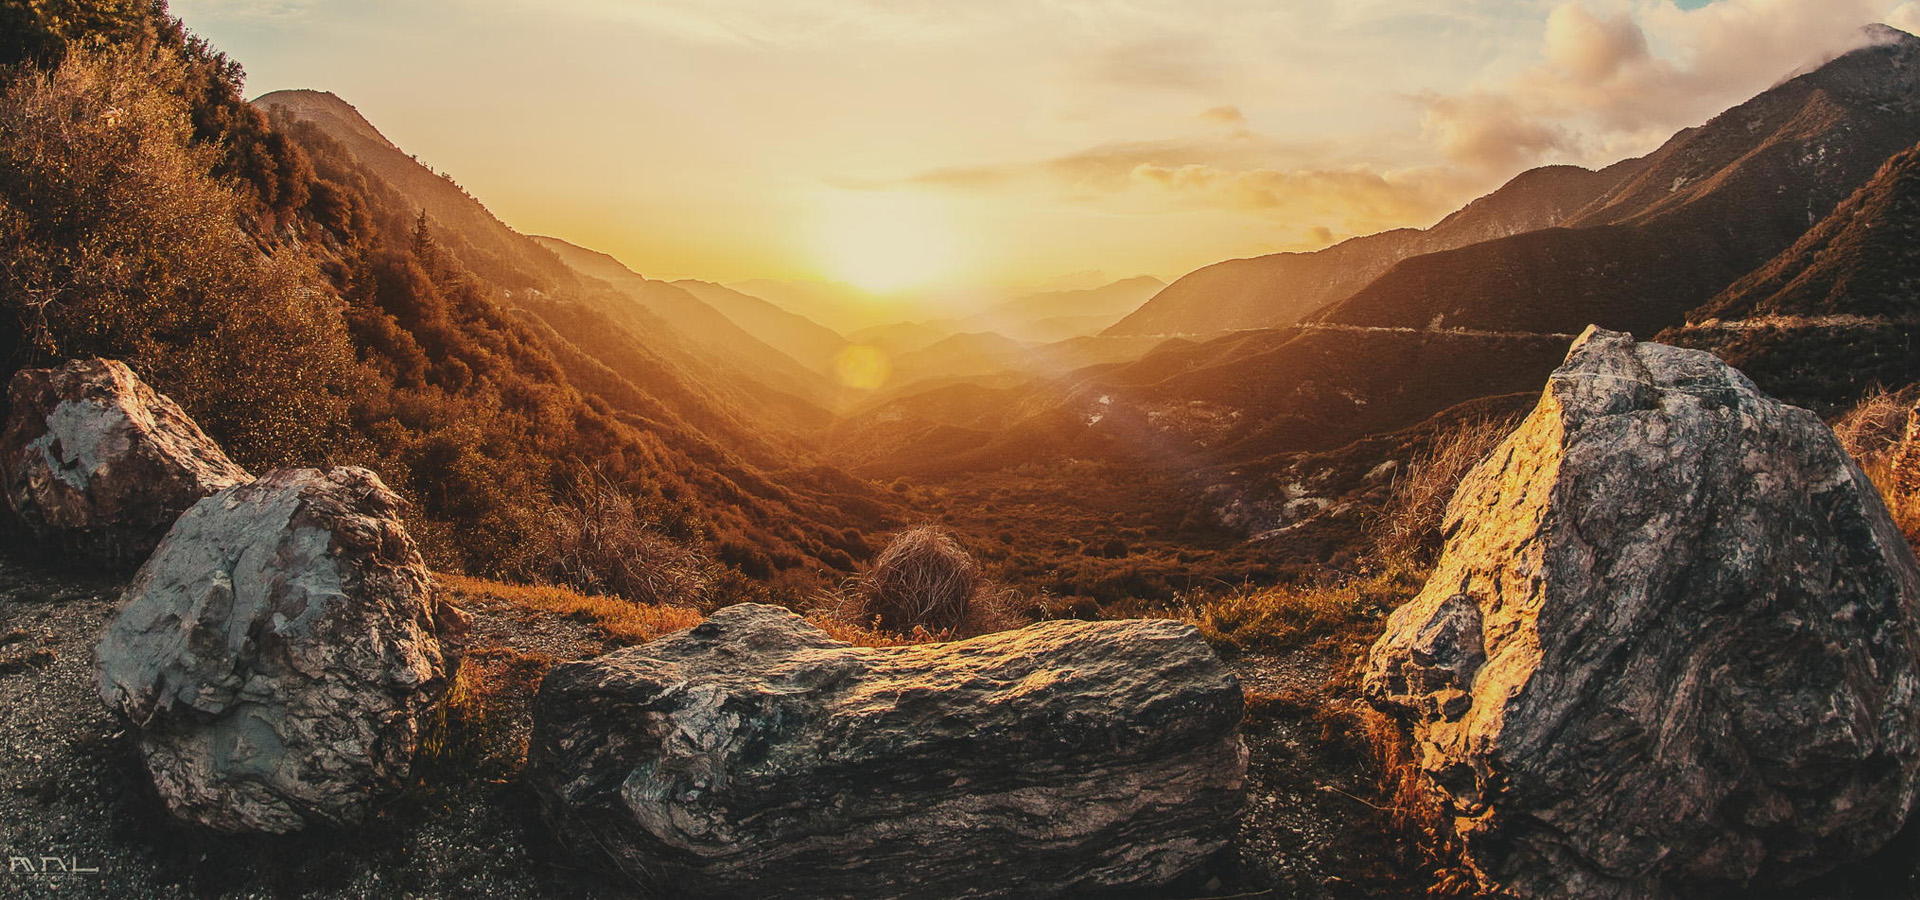 background  dusk  highway  mountain background image for